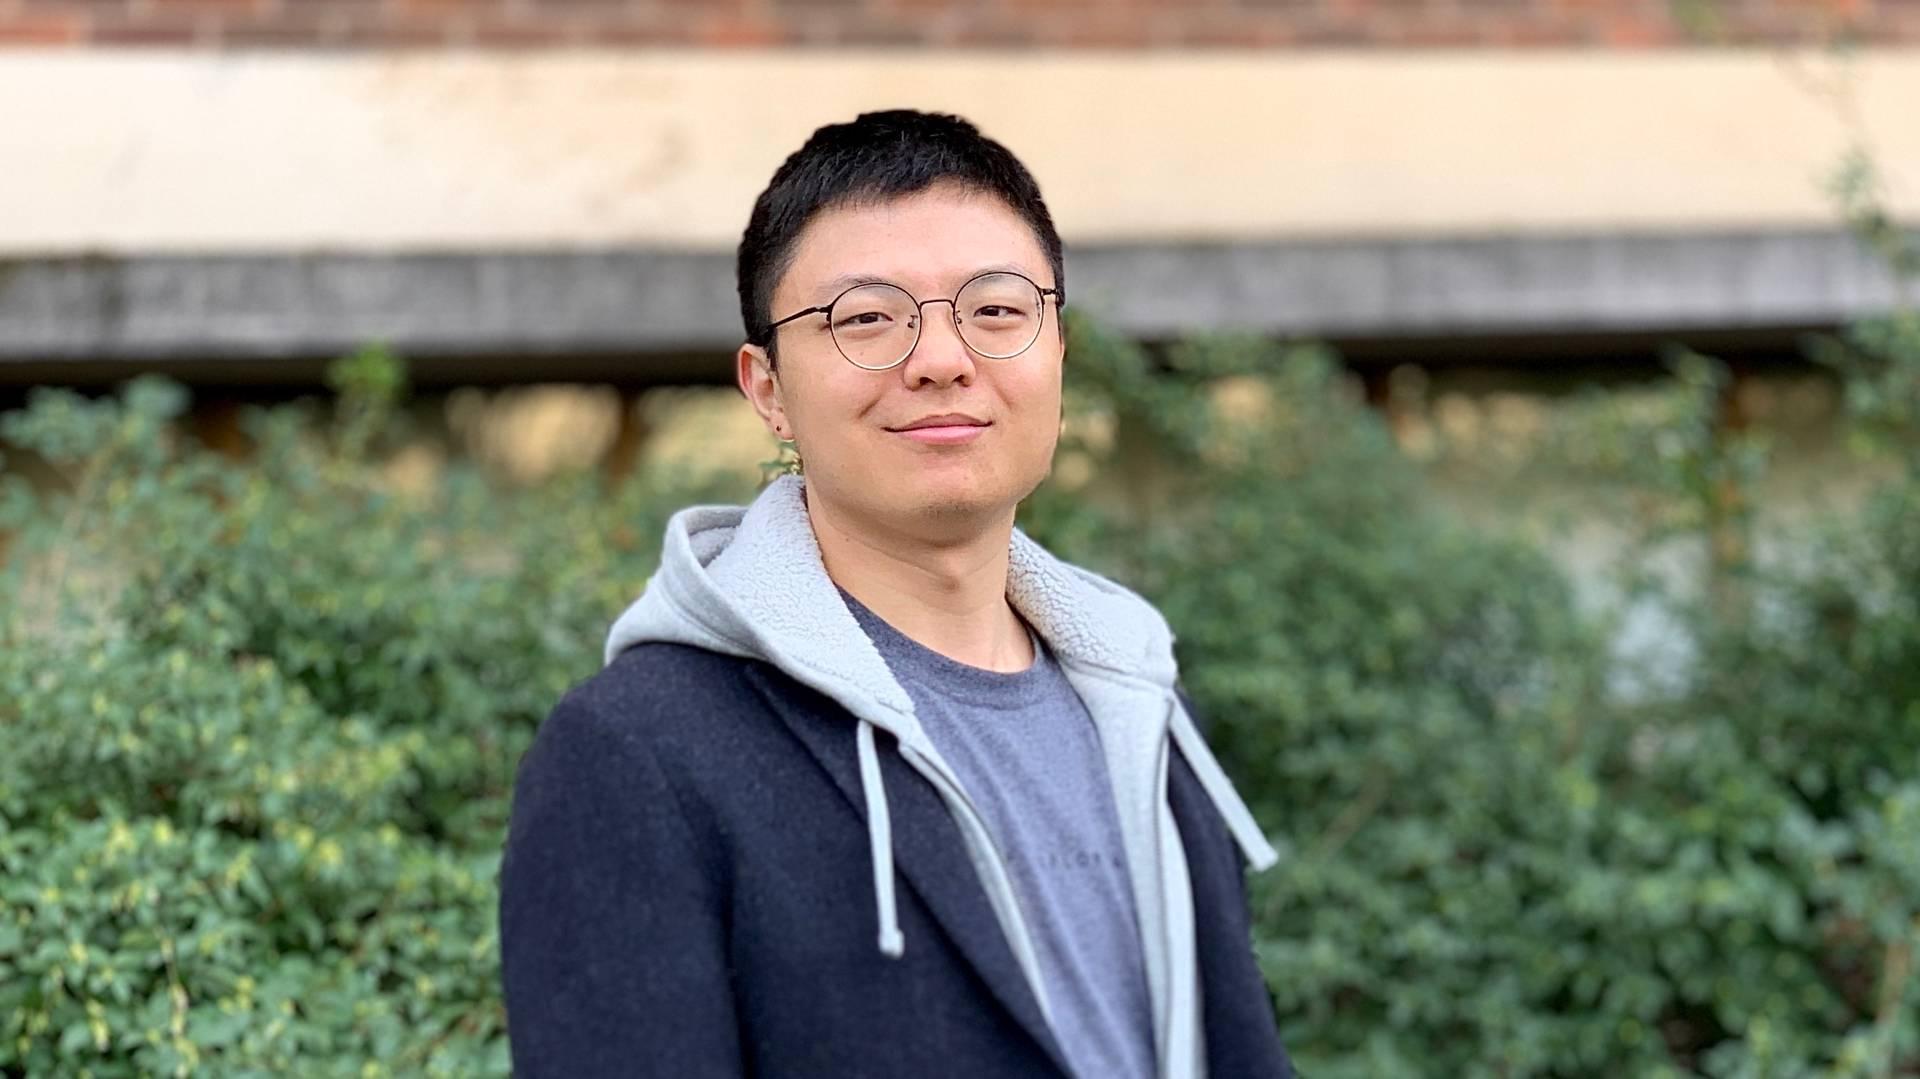 Zhiwen Ye